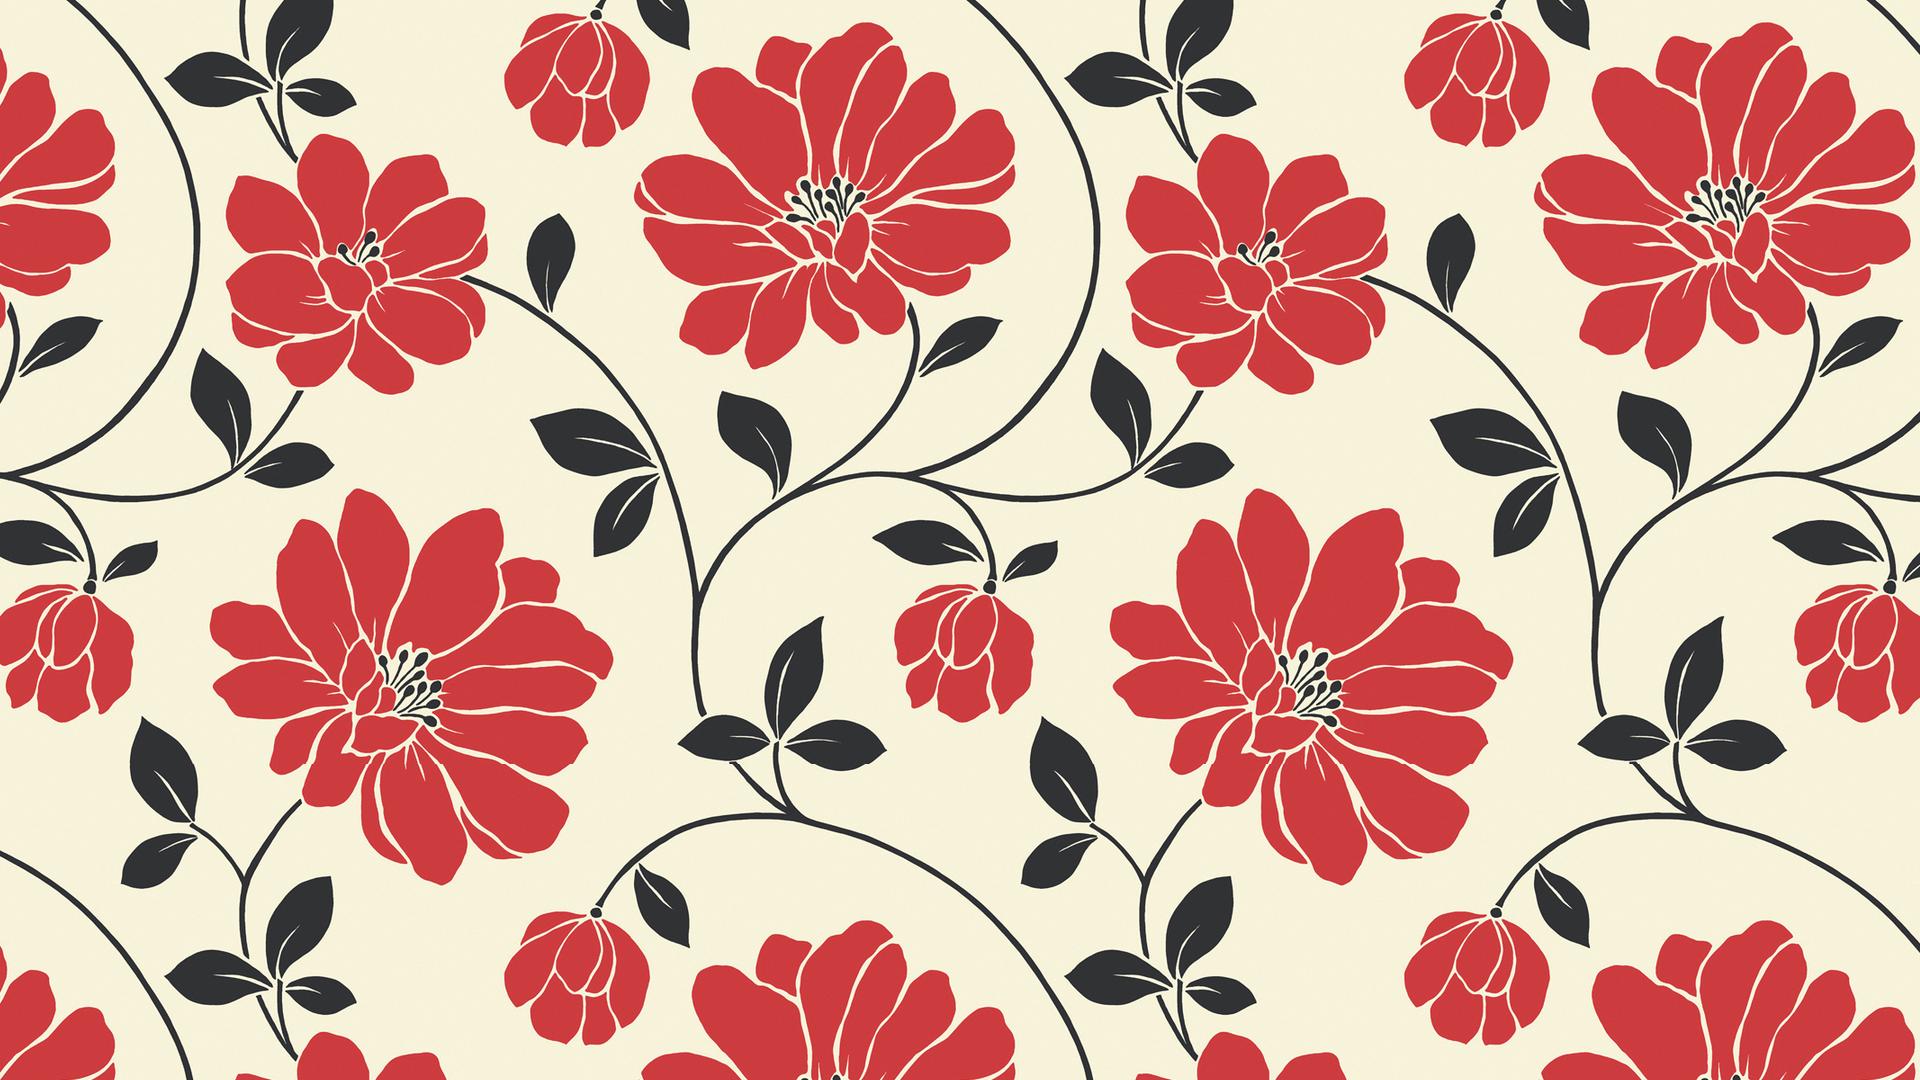 flower pattern tumblr pattern desktop background ...